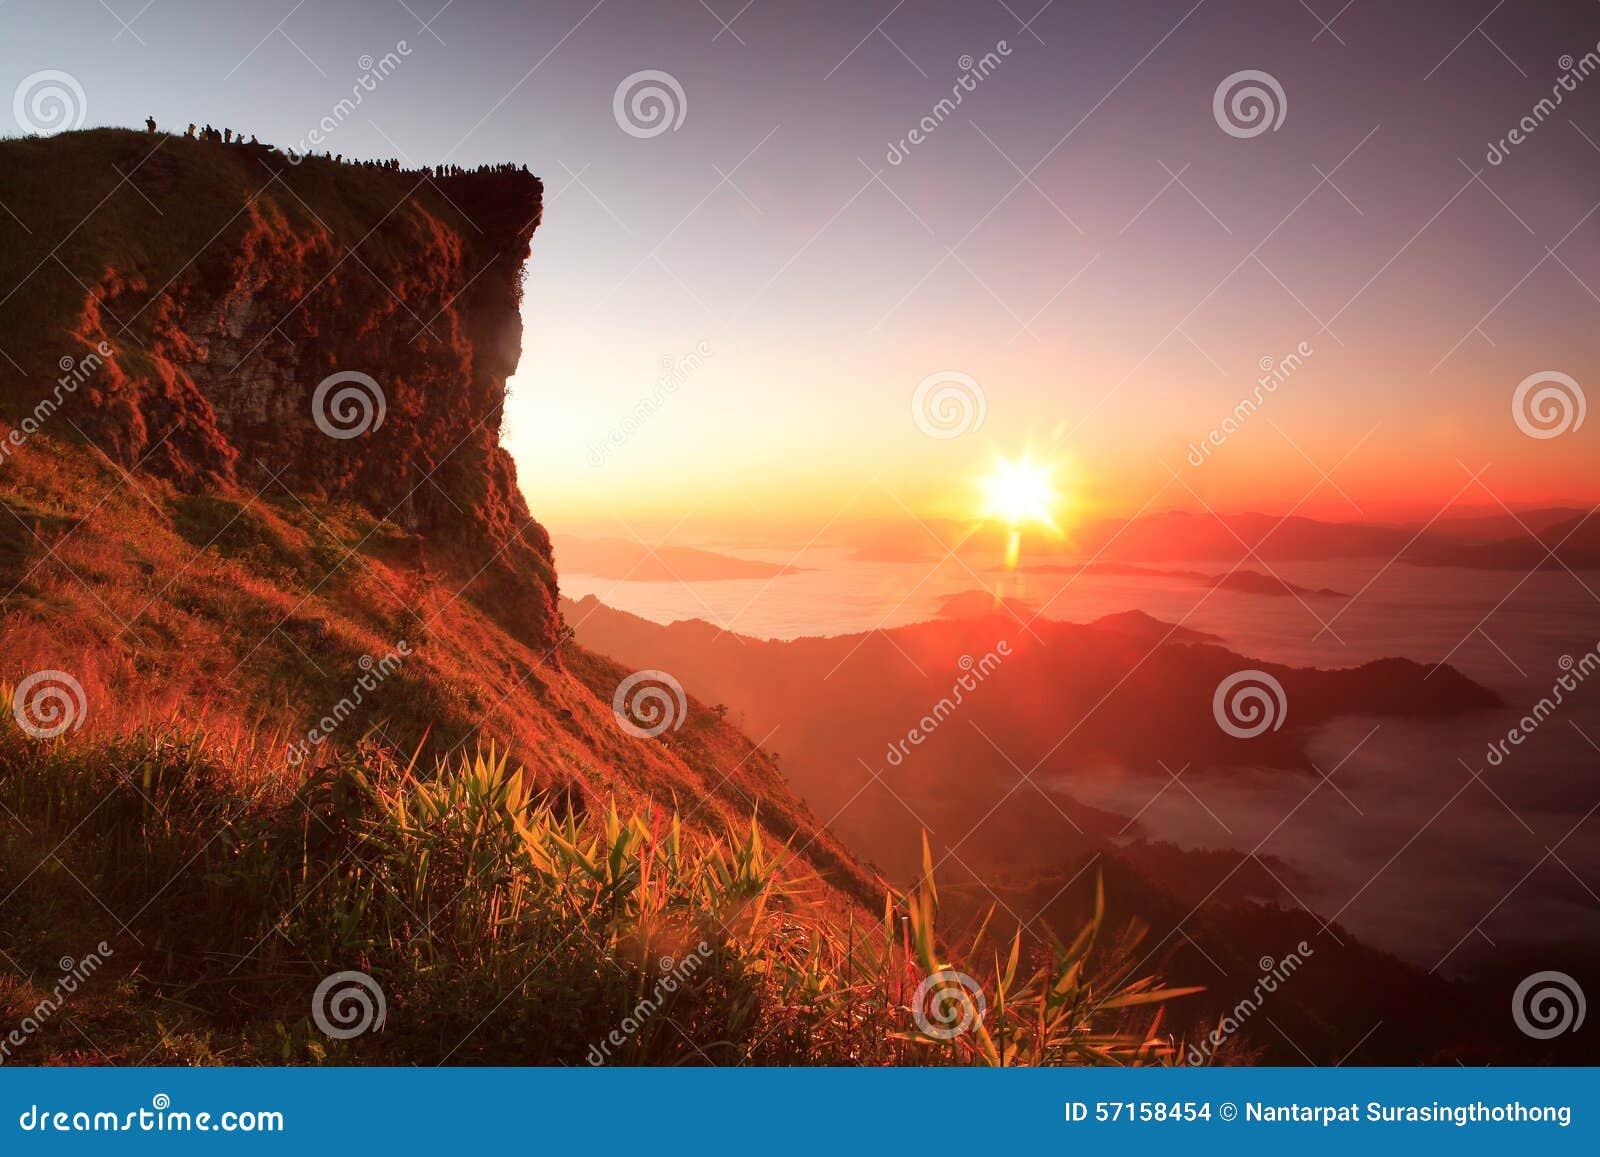 Netter Sonnenaufgang am Morgen auf Phu-Chi-Fa-Berg, Chiang Rai, Thailand